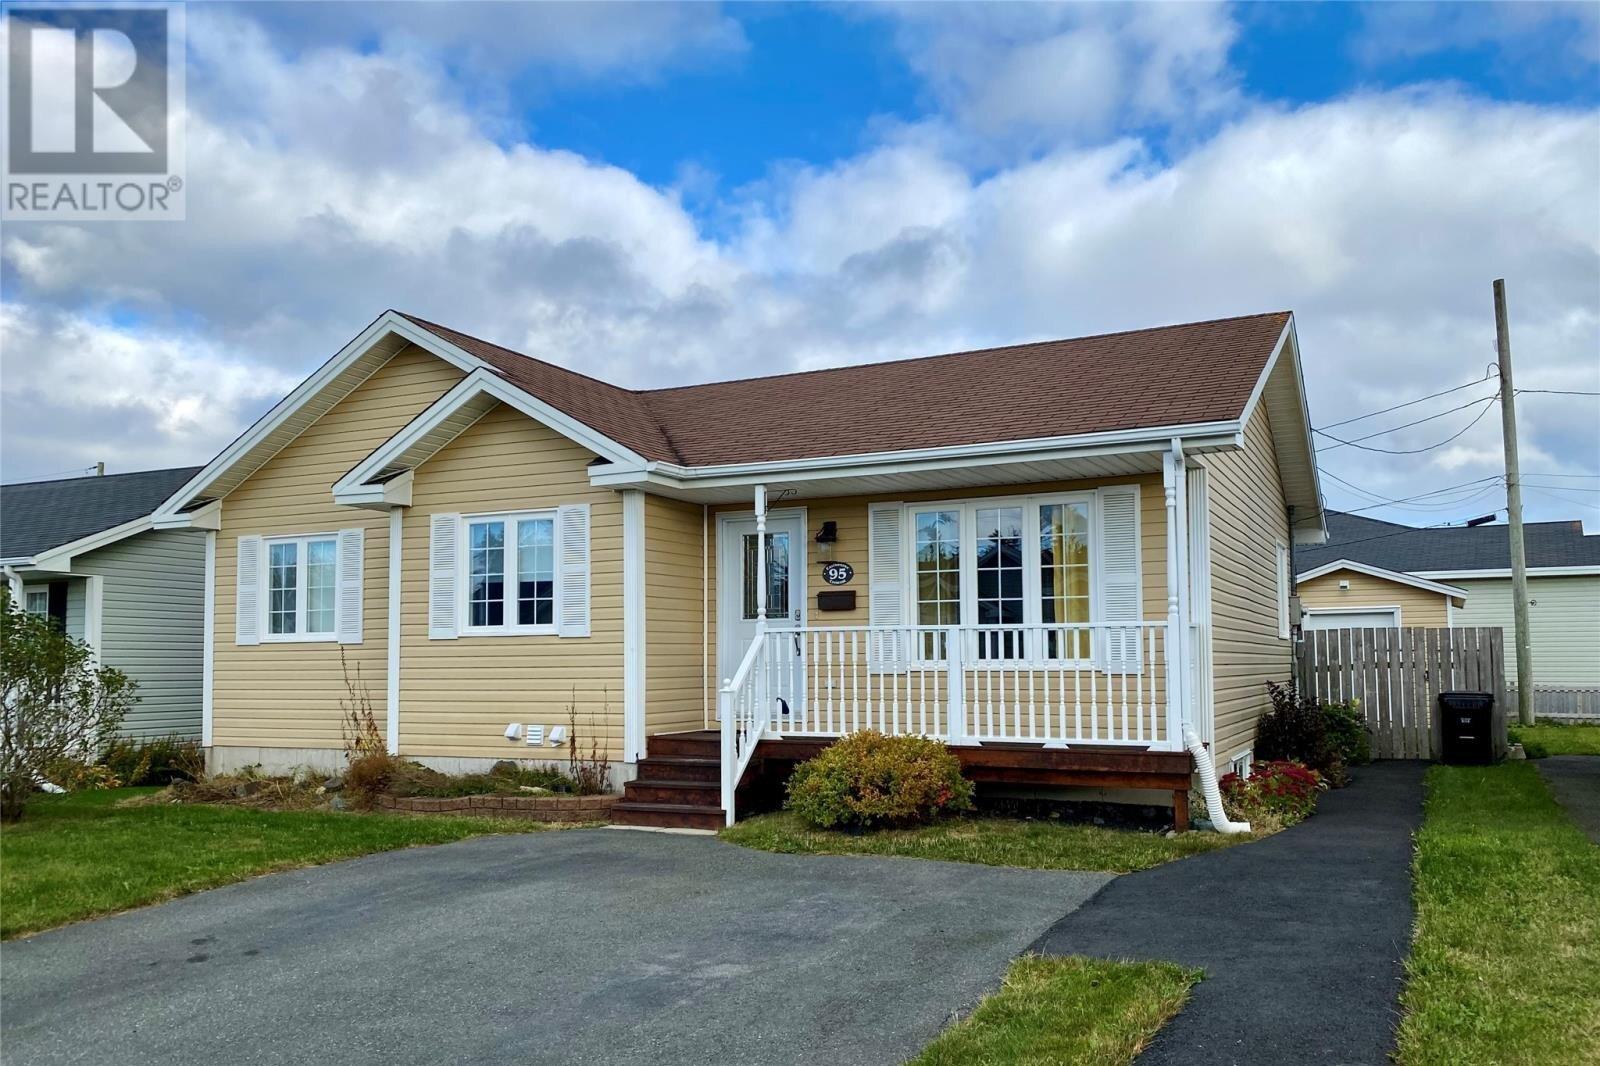 House for sale at 95 Eastbourne Cres St. John's Newfoundland - MLS: 1222618